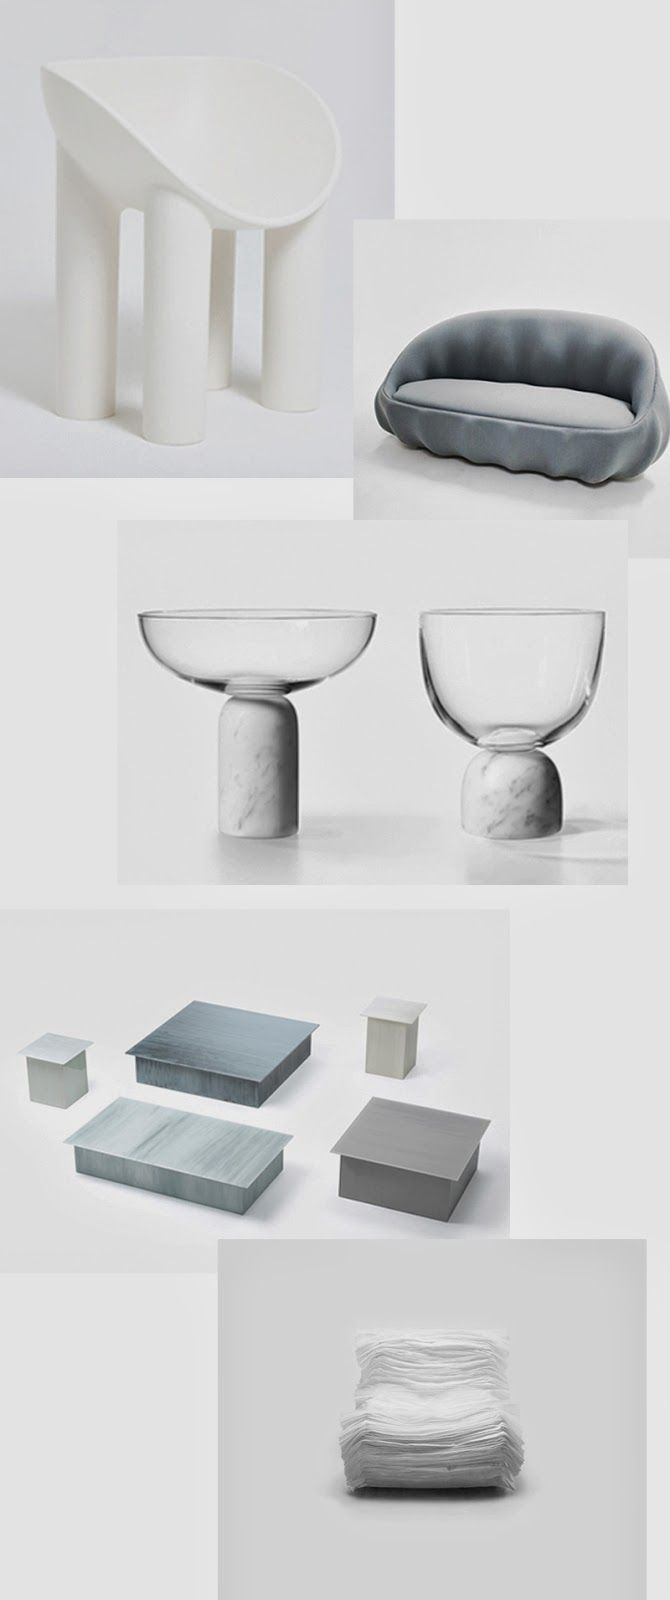 Milan Design Week 2014   A first selection